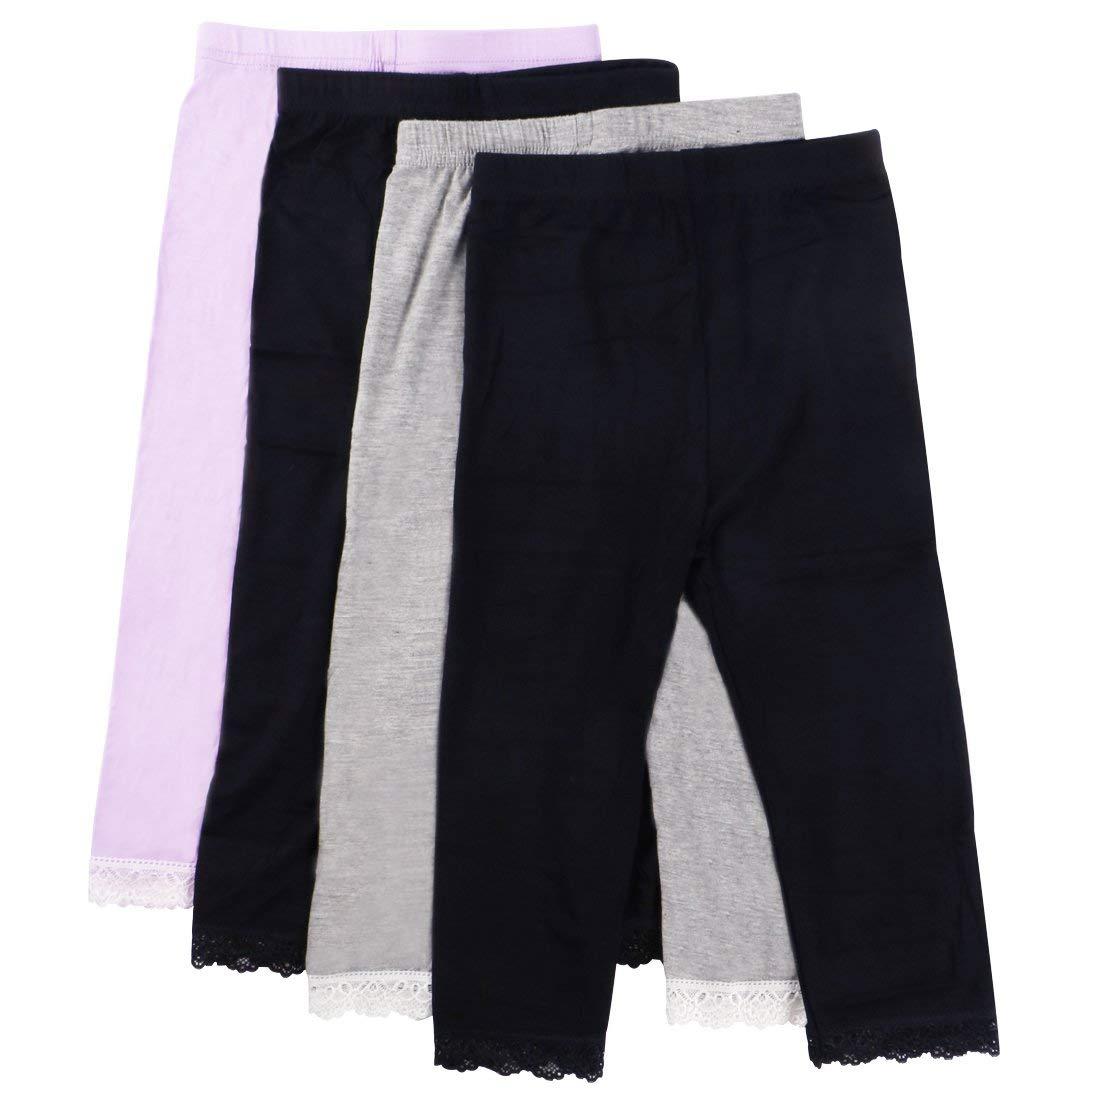 ebe2fd74ae785e Get Quotations · MyKazoe Girls Ultra Soft Seamless Capri Leggings With Lace  Trim (Set of 4)